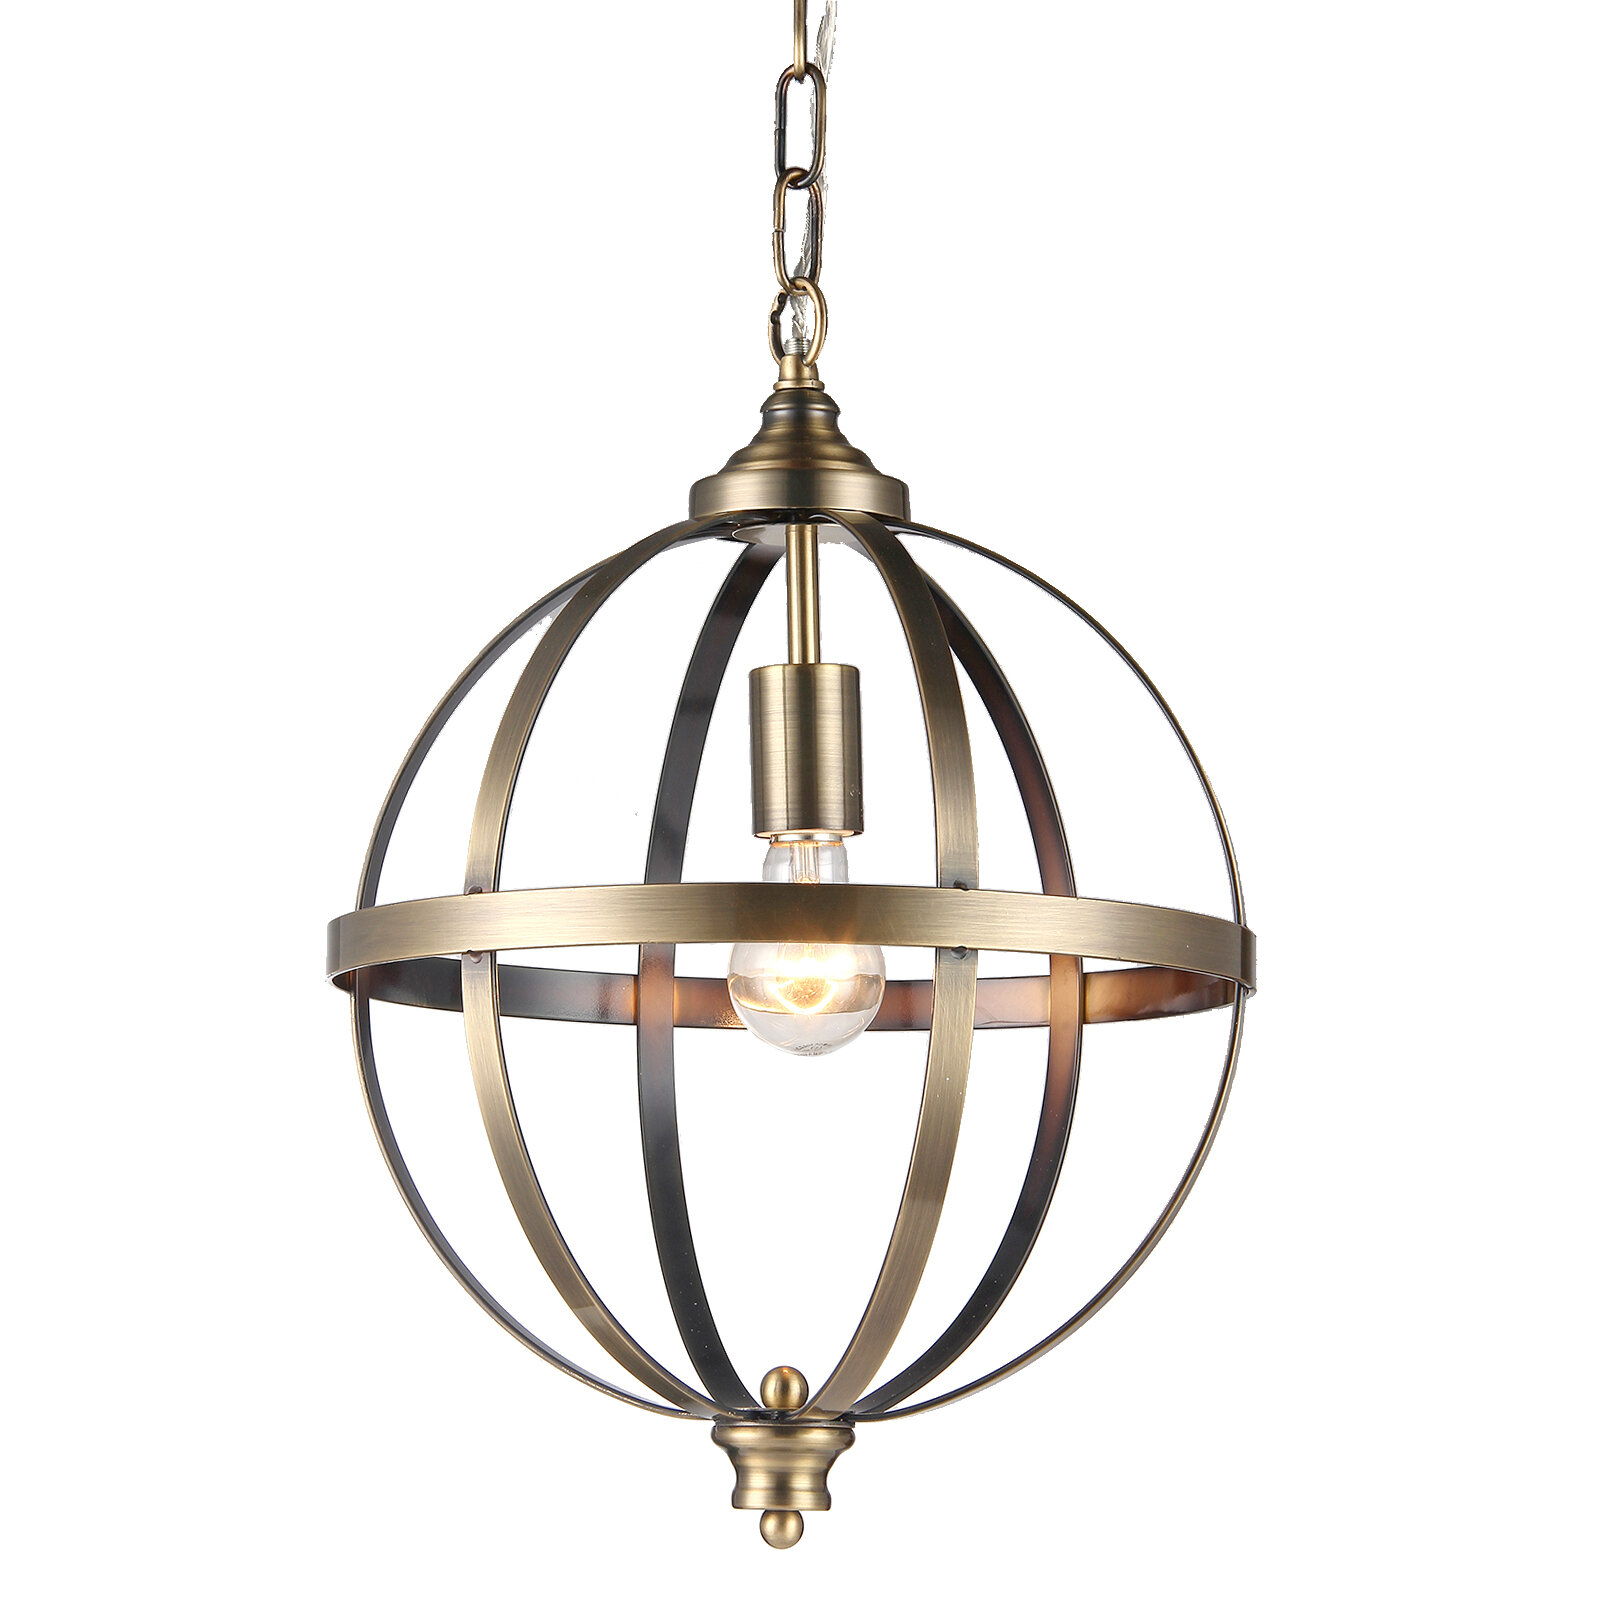 Eberhart Salle De Bain eberhart 1-light single globe pendant